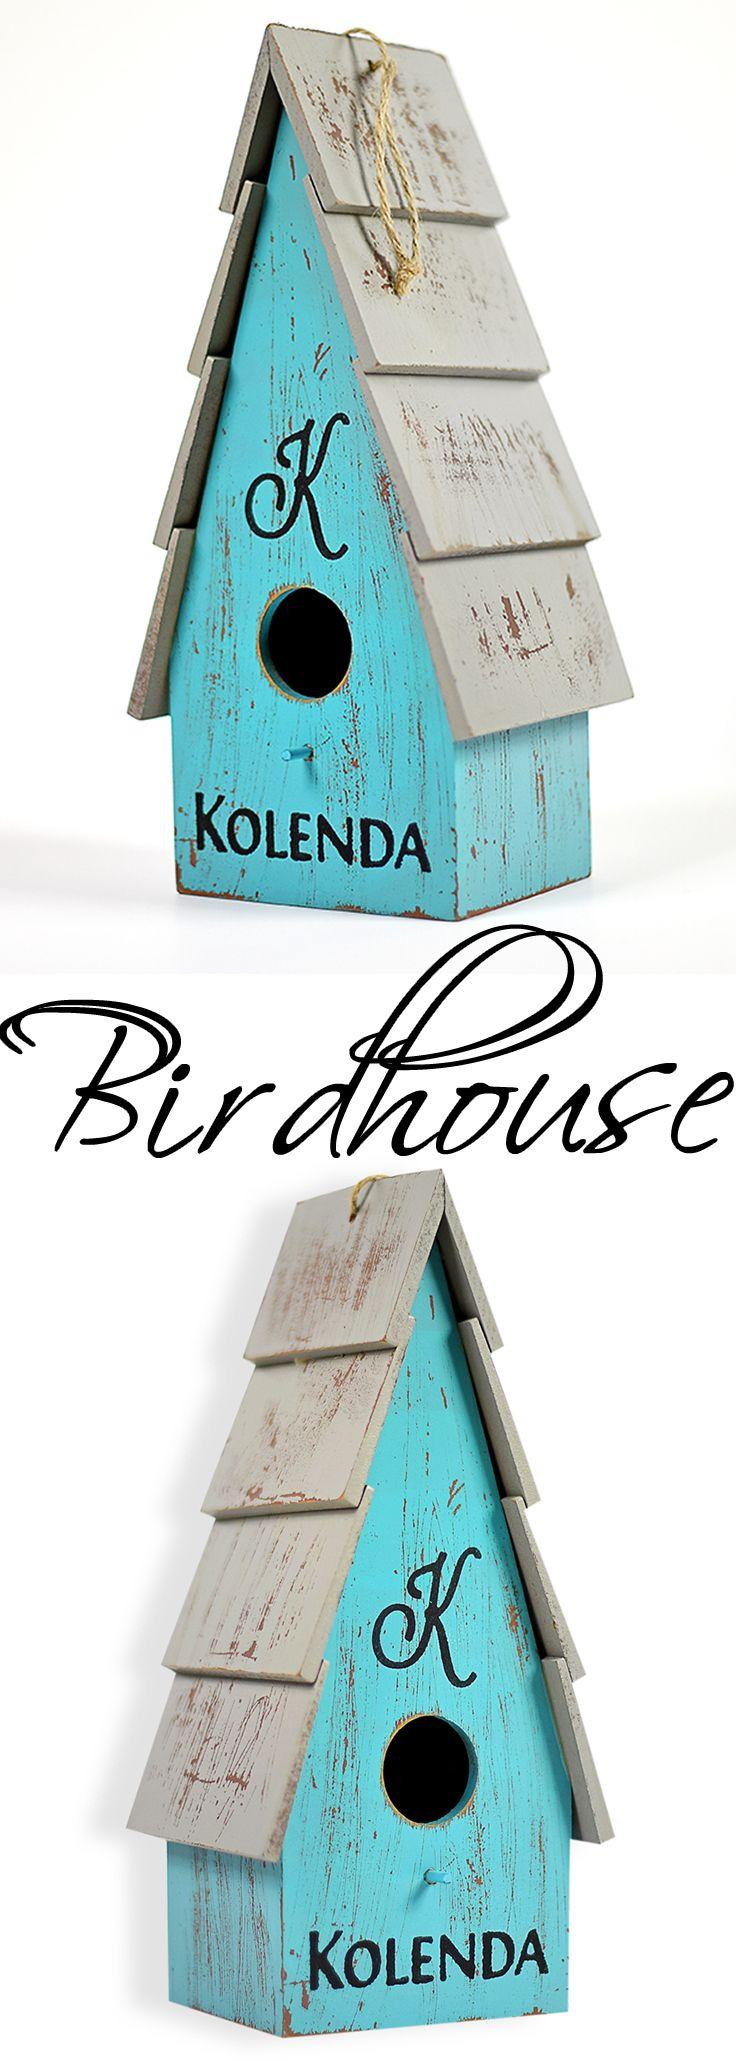 custom birdhouse, personalized, indoor birdhouse, bird feeder, bird bath, hanging bird feeder, hummingbird feeder, modern bird feeder, wood bird feeder, window bird feeder, garden decor, birdfeeder, ceramic bird feeder